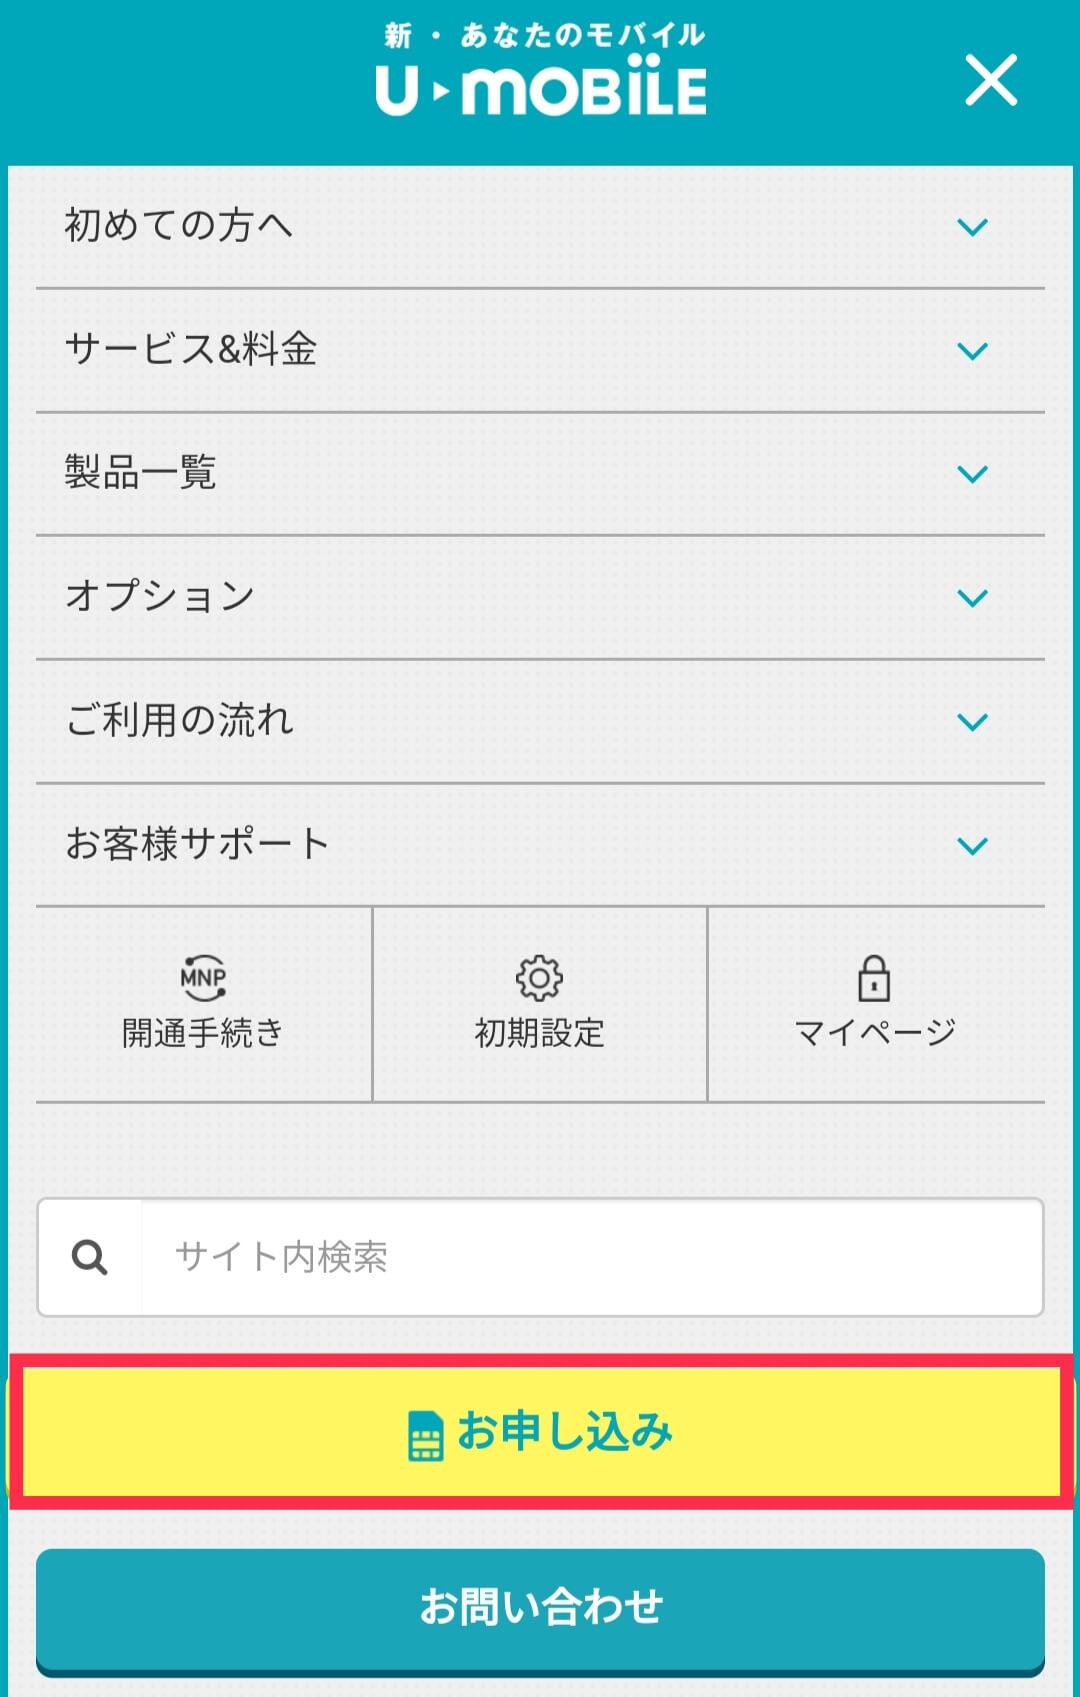 U-mobileにお申込み